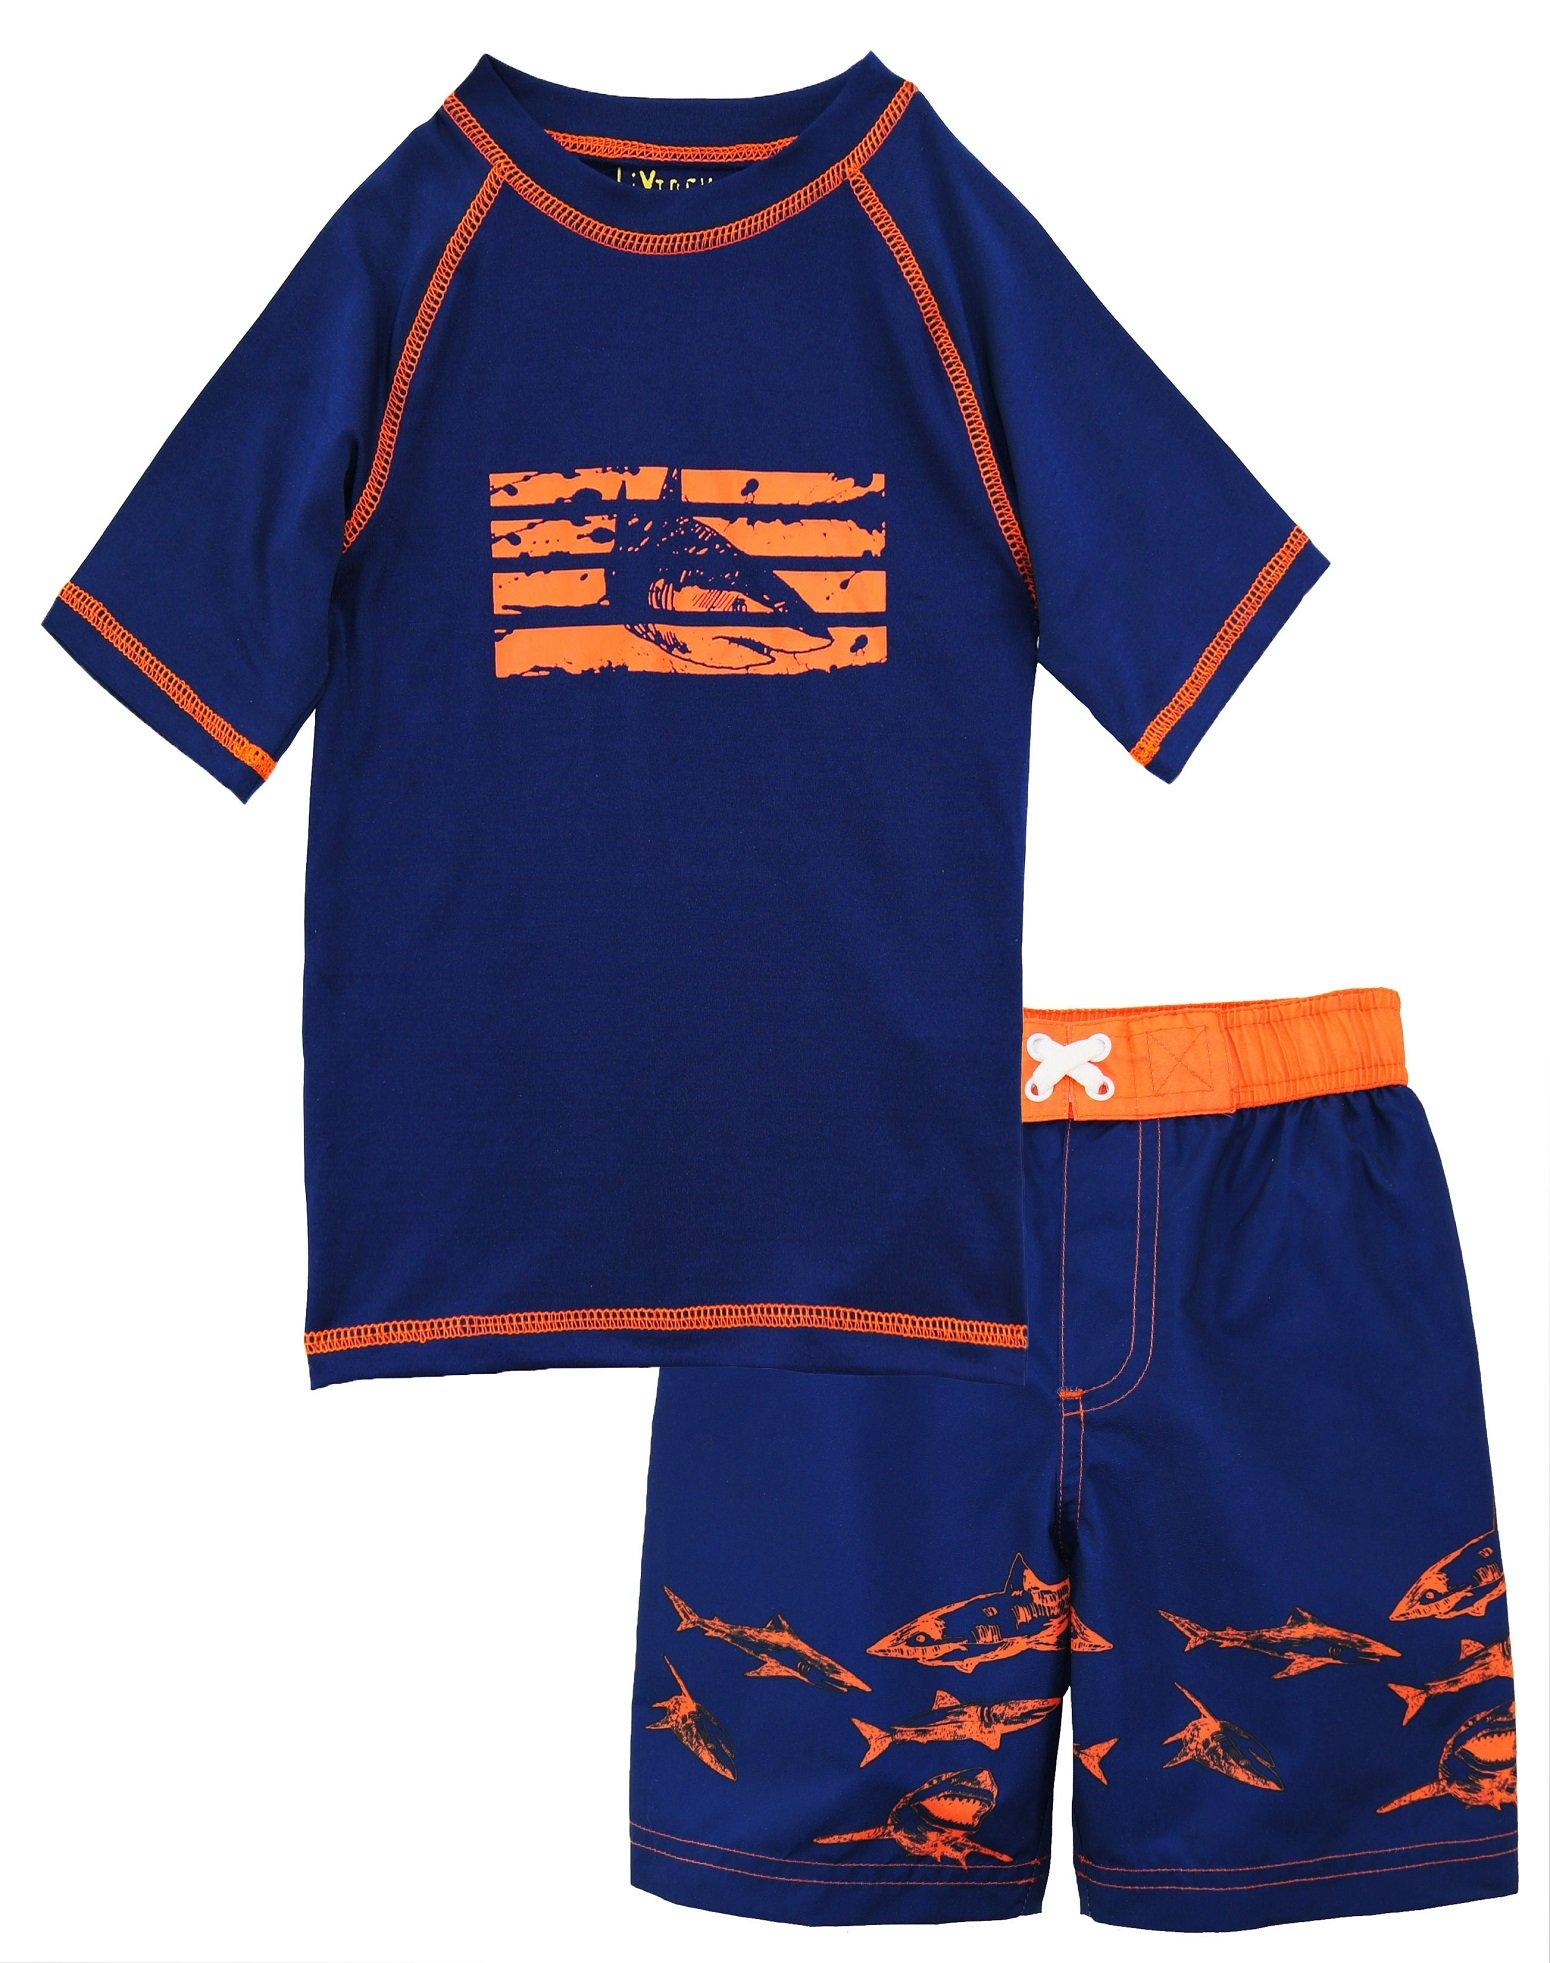 iXtreme Little Boys Swimwear Shark Rash guard Swim Board Short Trunk, Navy, 4T